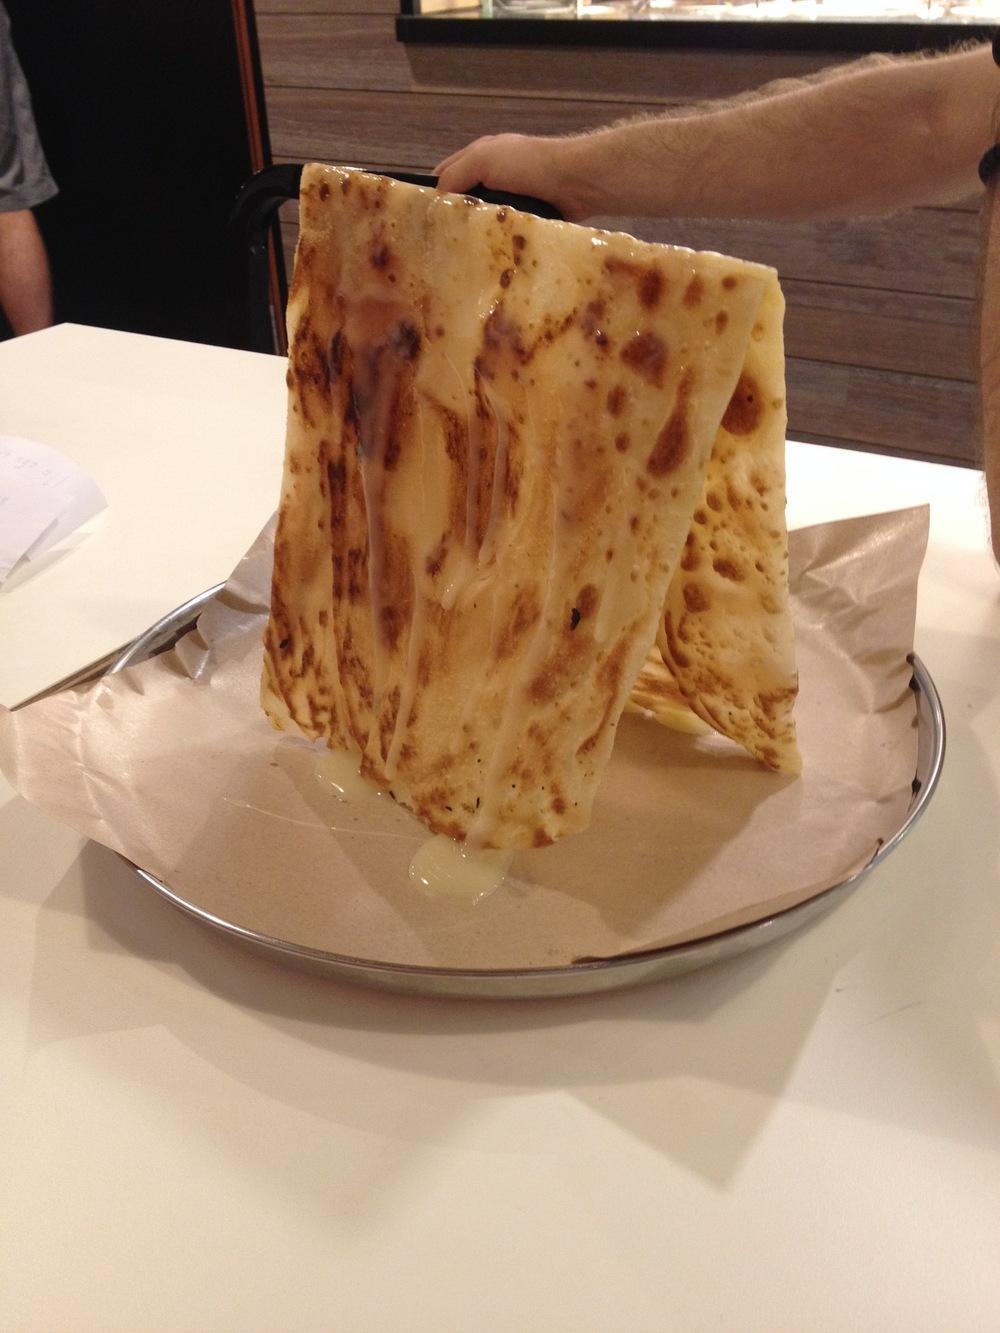 A new Singaporean delicacy